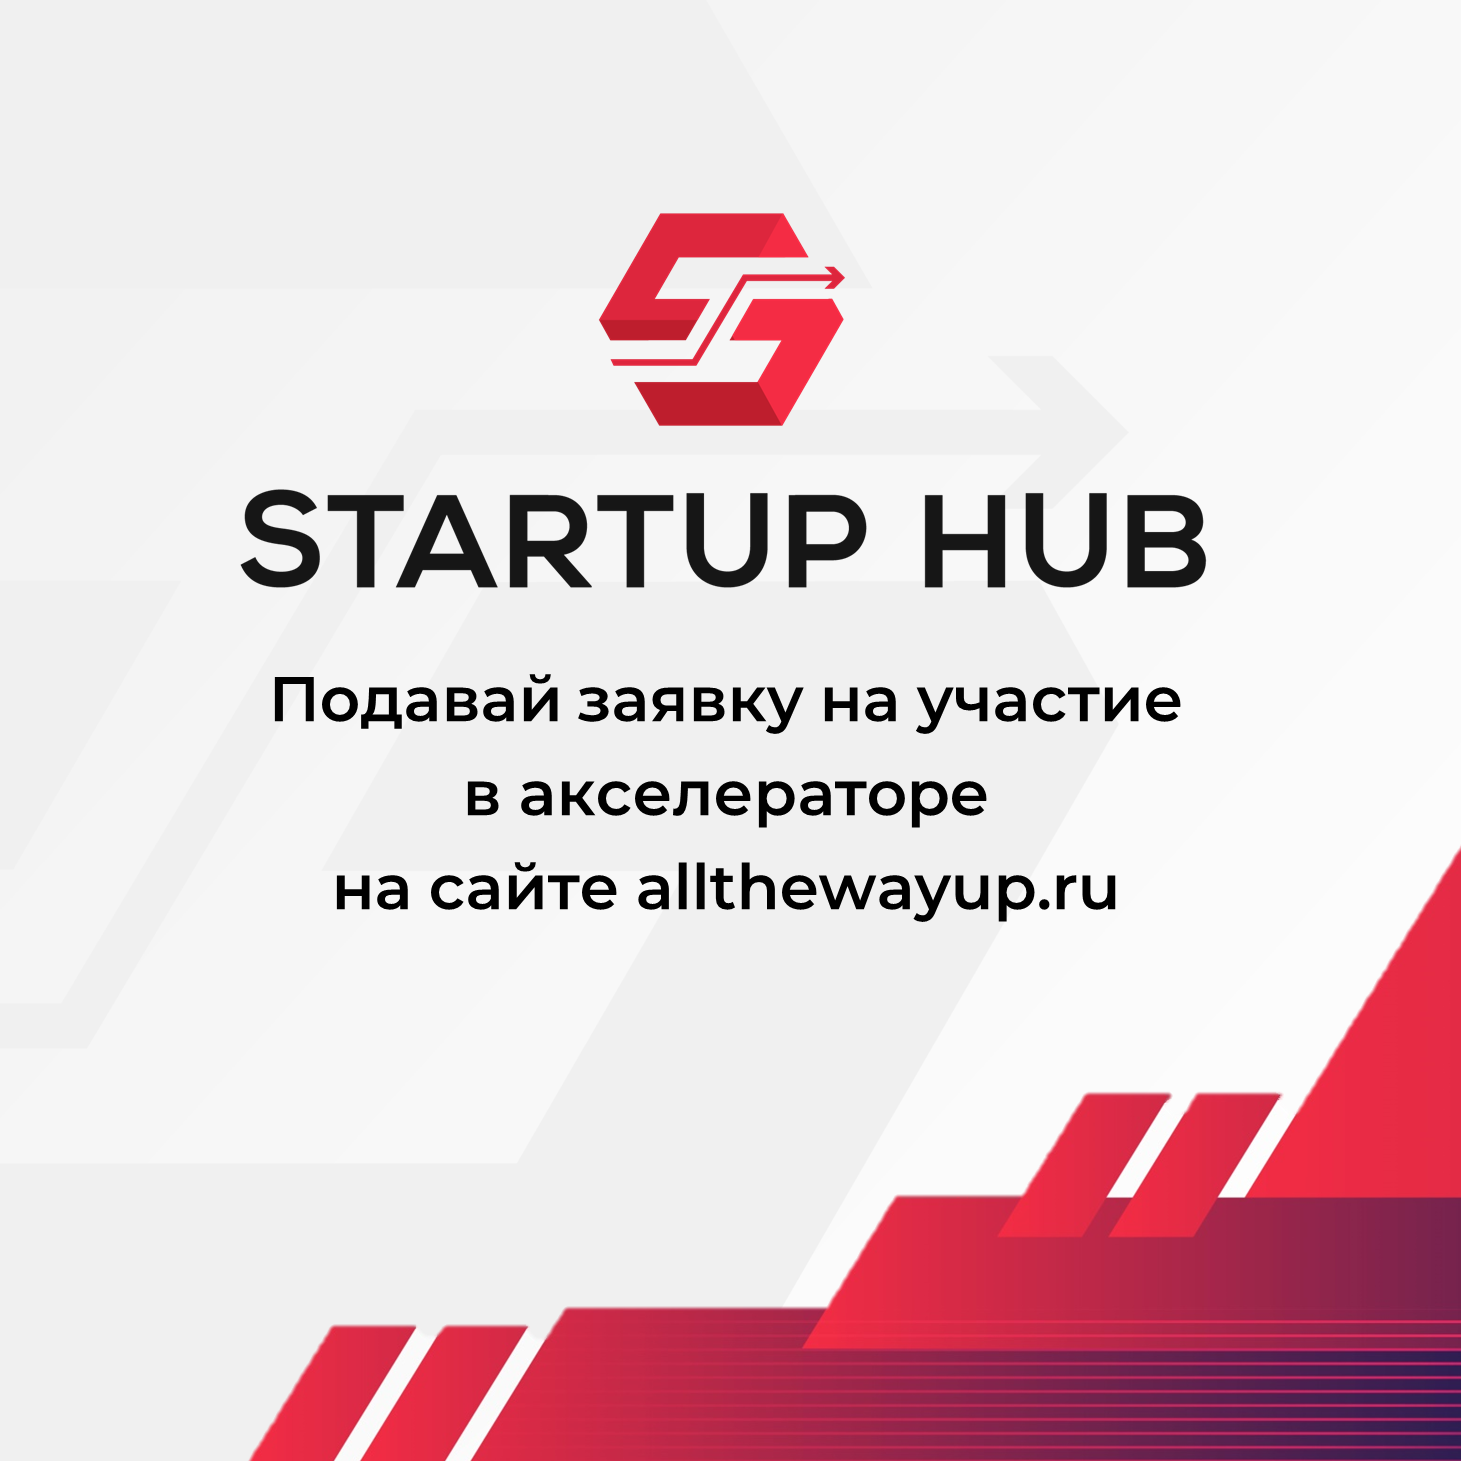 Стартап-акселератор STARTUP HUB объявляет набор команд открытым!